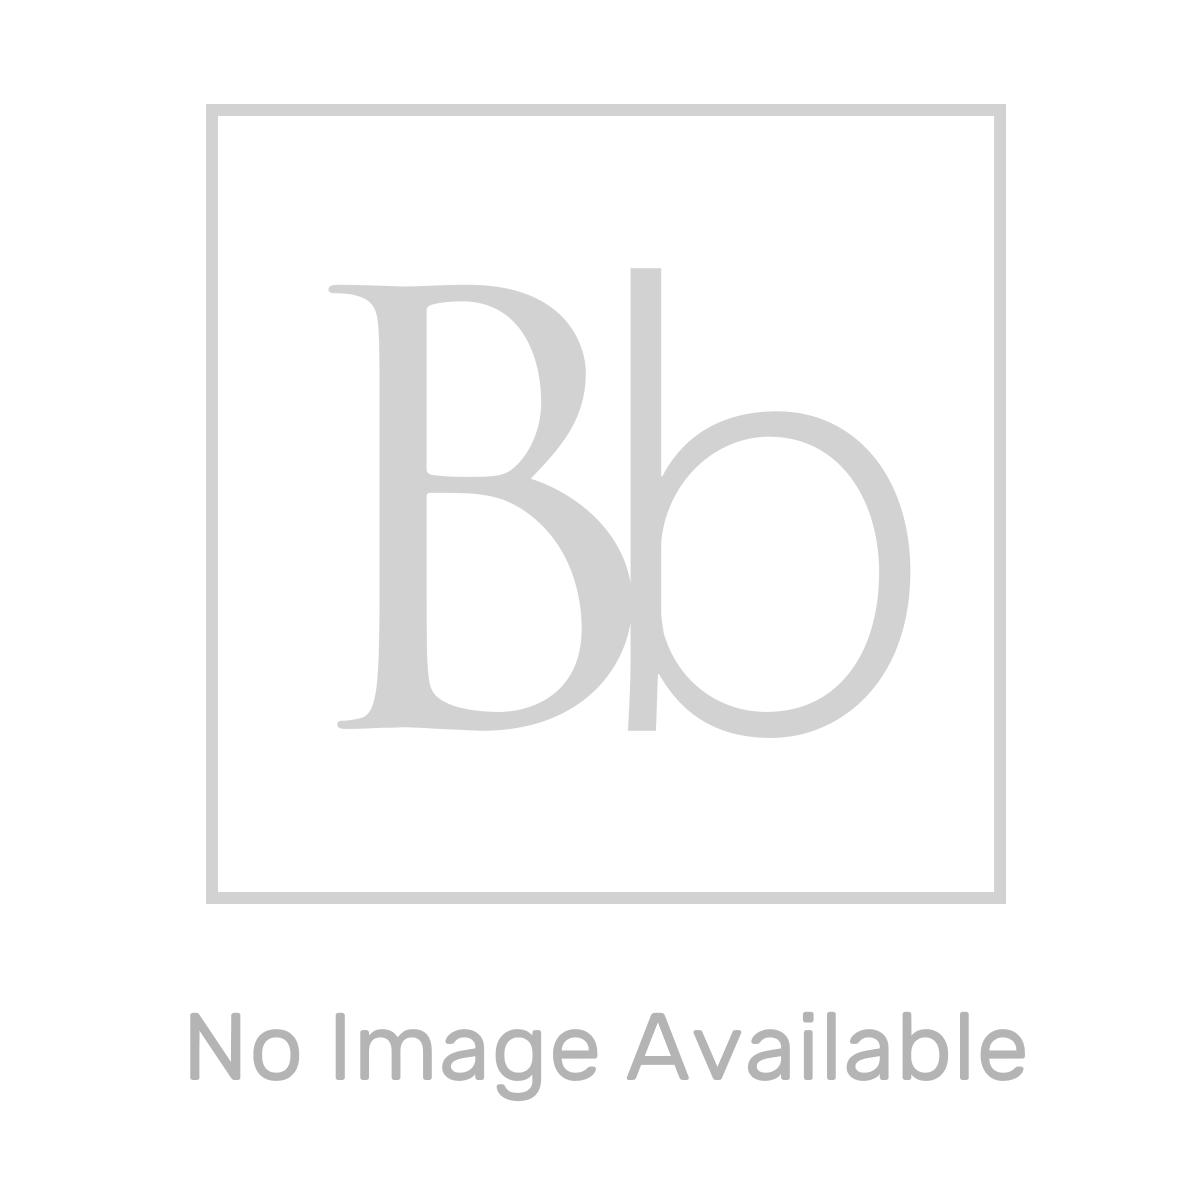 Premier Pearlstone Shower Tray Riser Kit 1200 x 900mm Offset Quadrant Fitting